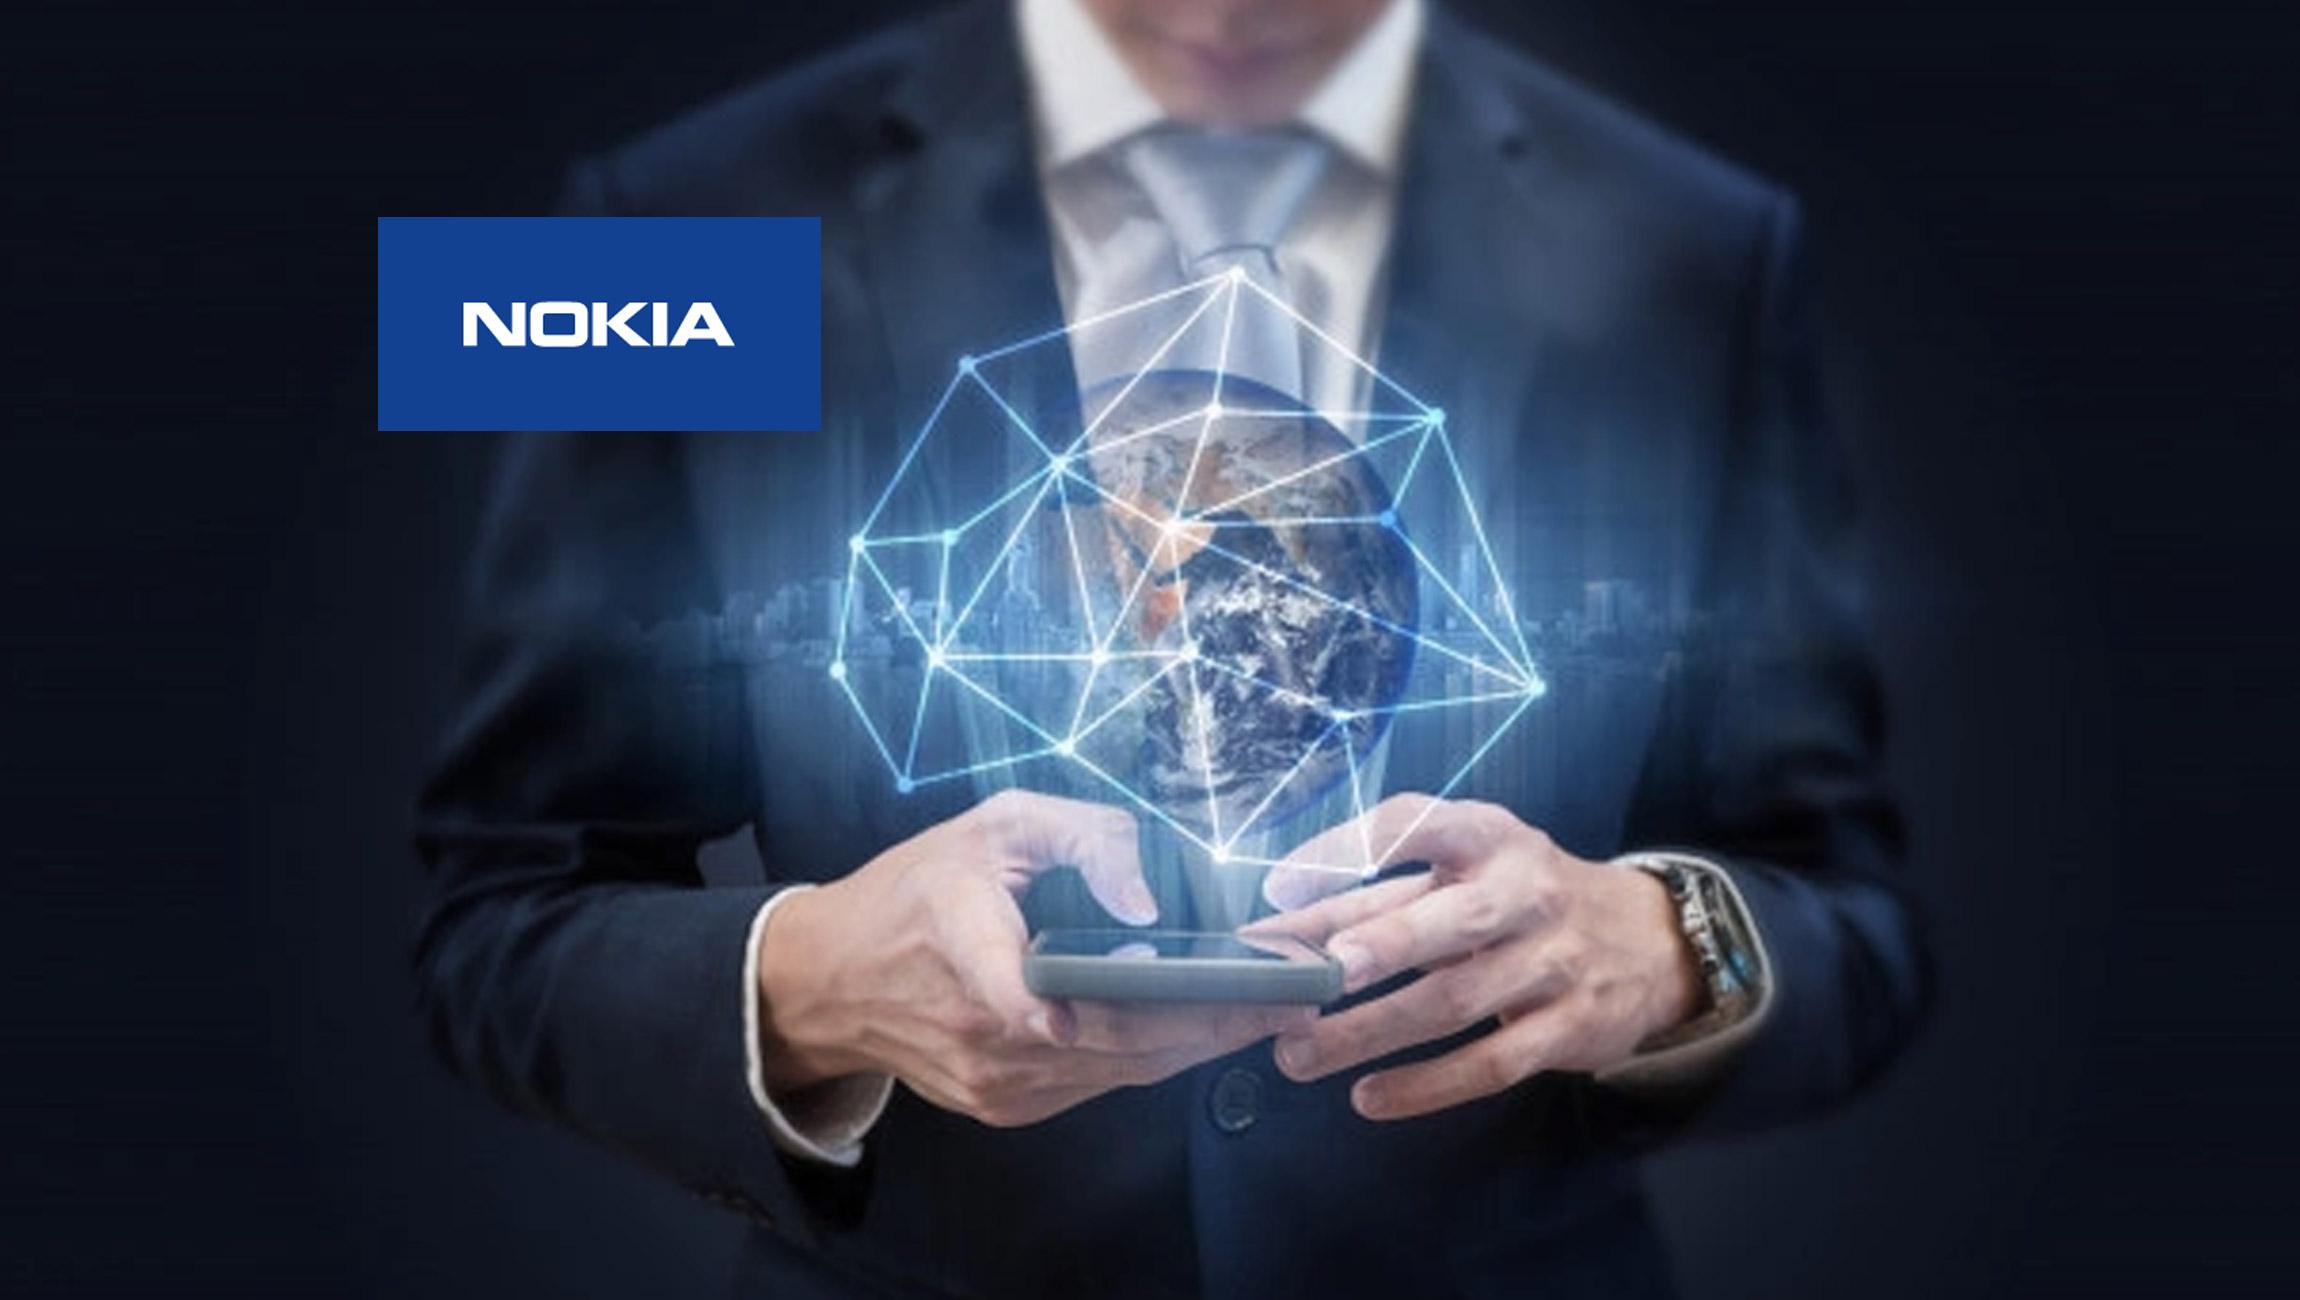 Nokia Deepfield identifies 2020 network traffic, internet consumption trends in new intelligence report